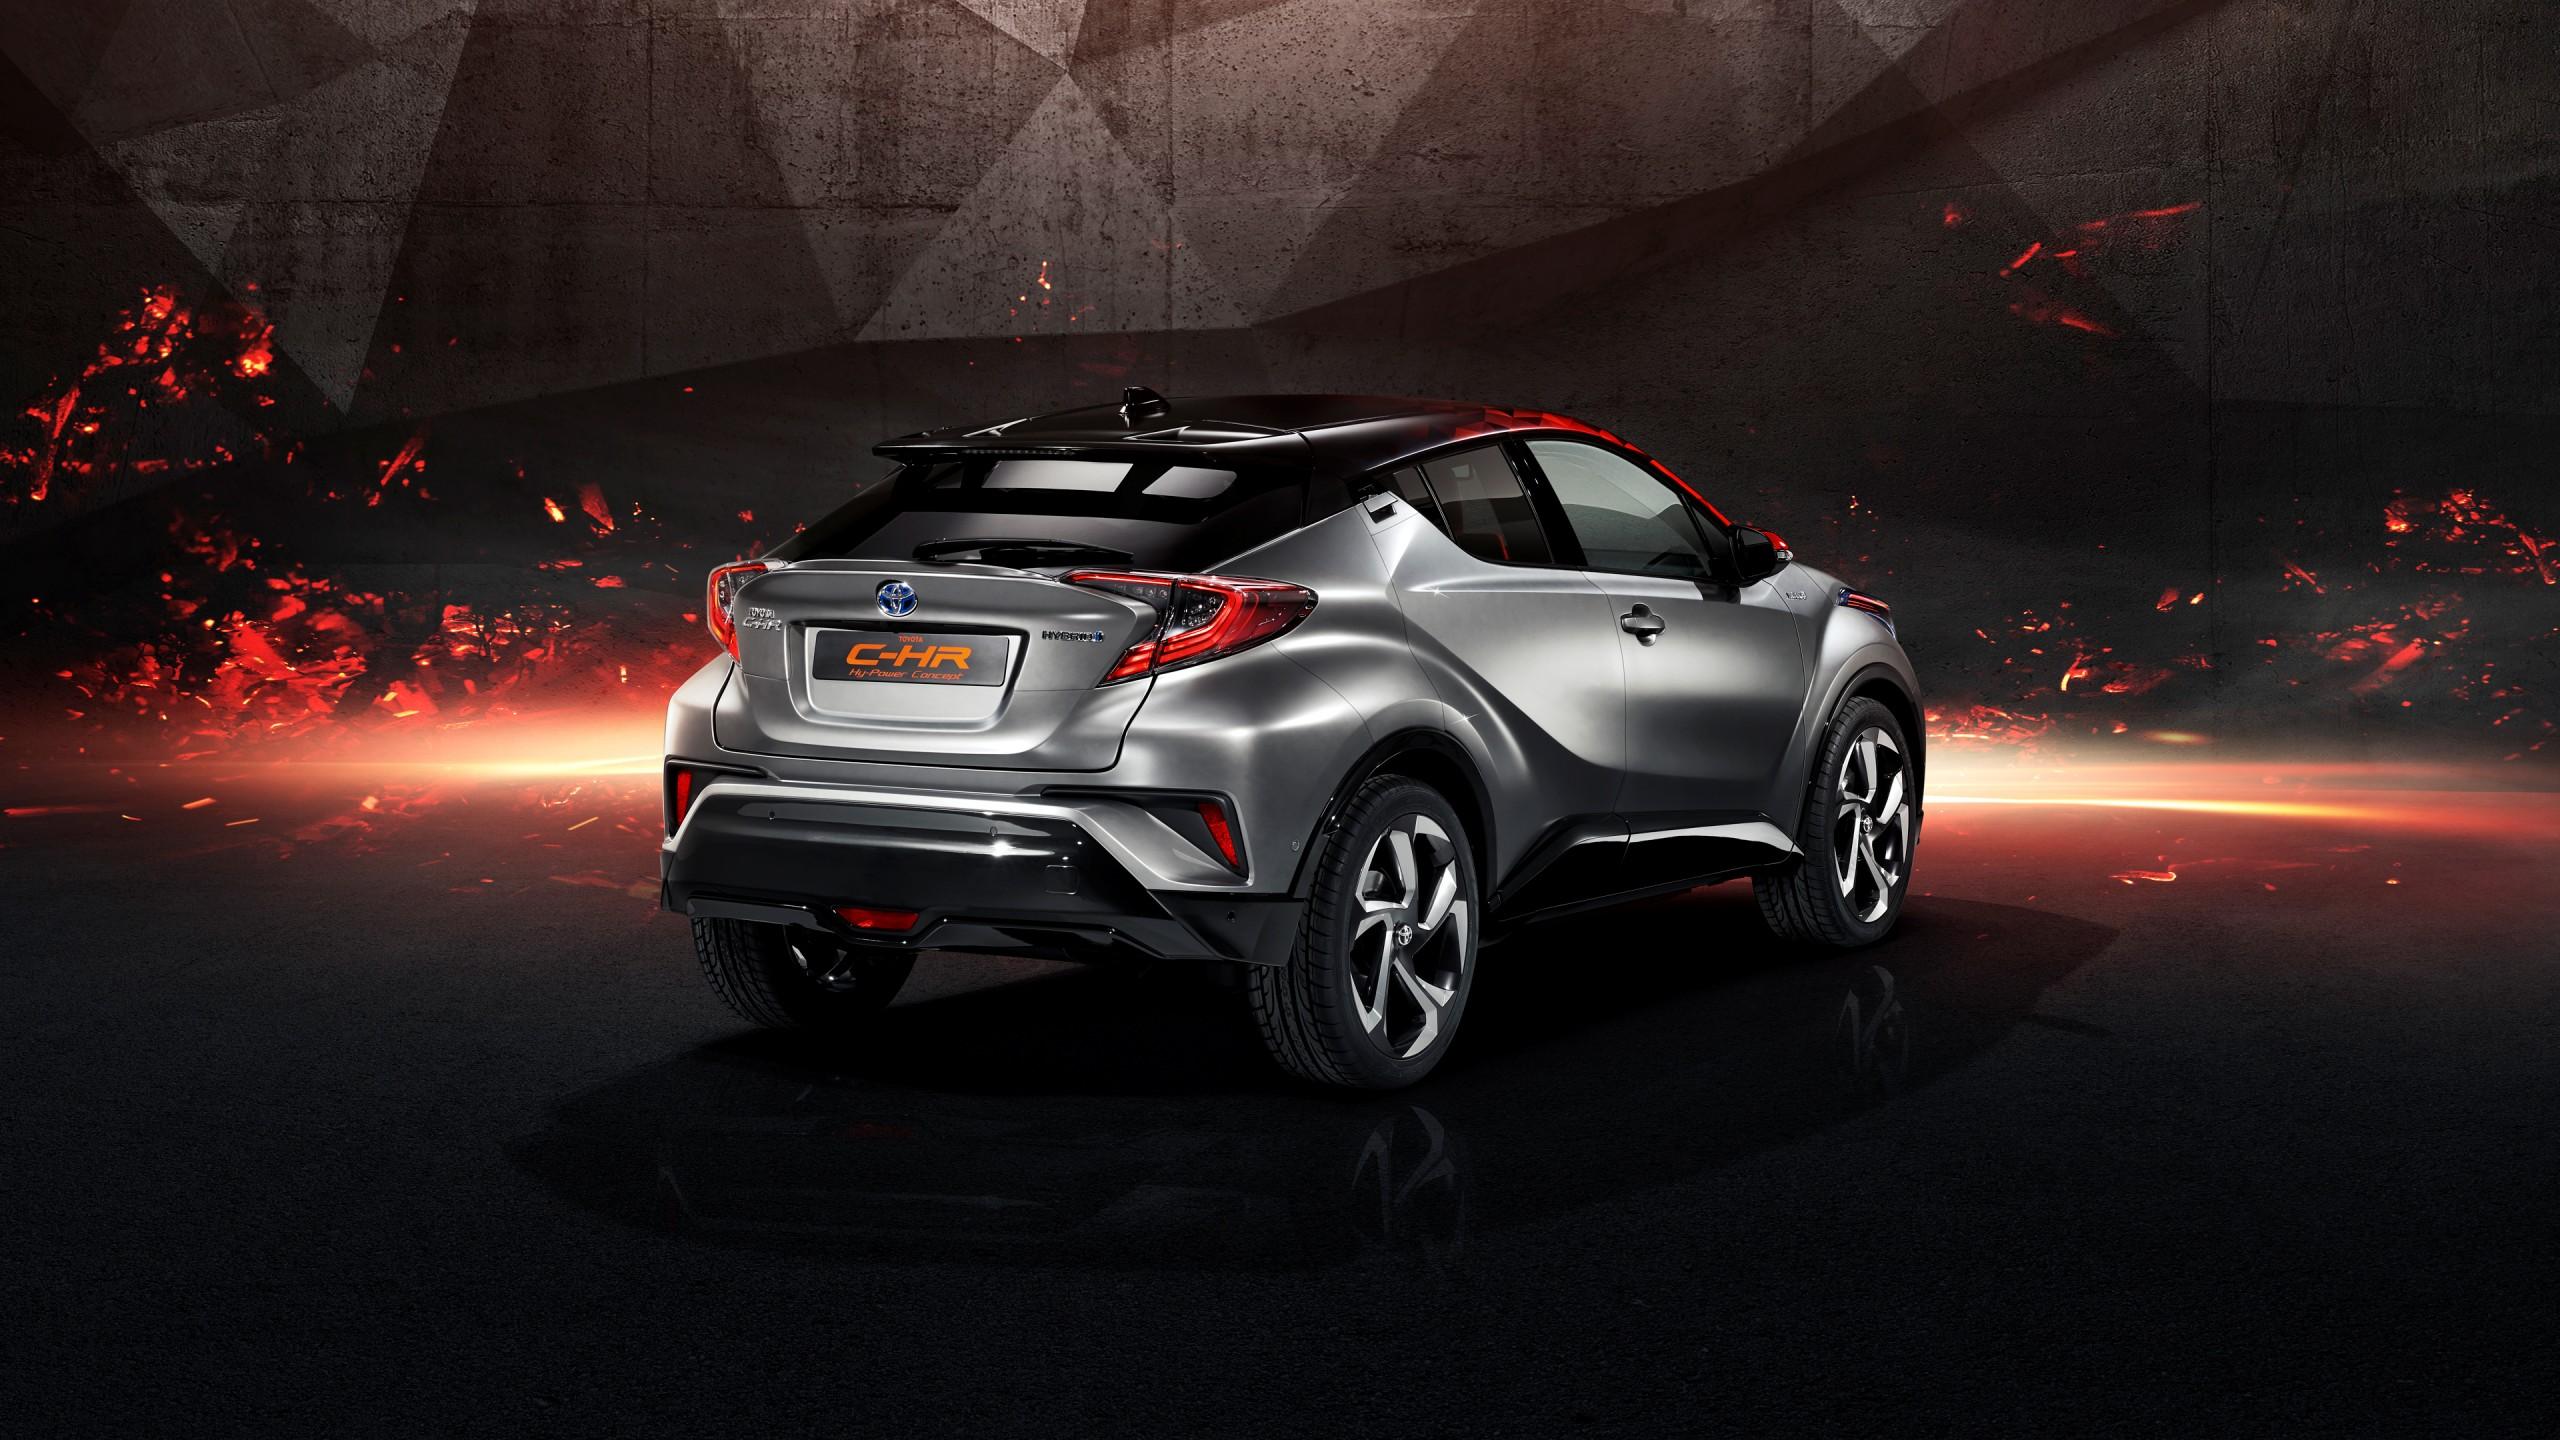 toyota c hr hy power concept 2017 frankfurt motor show 4k